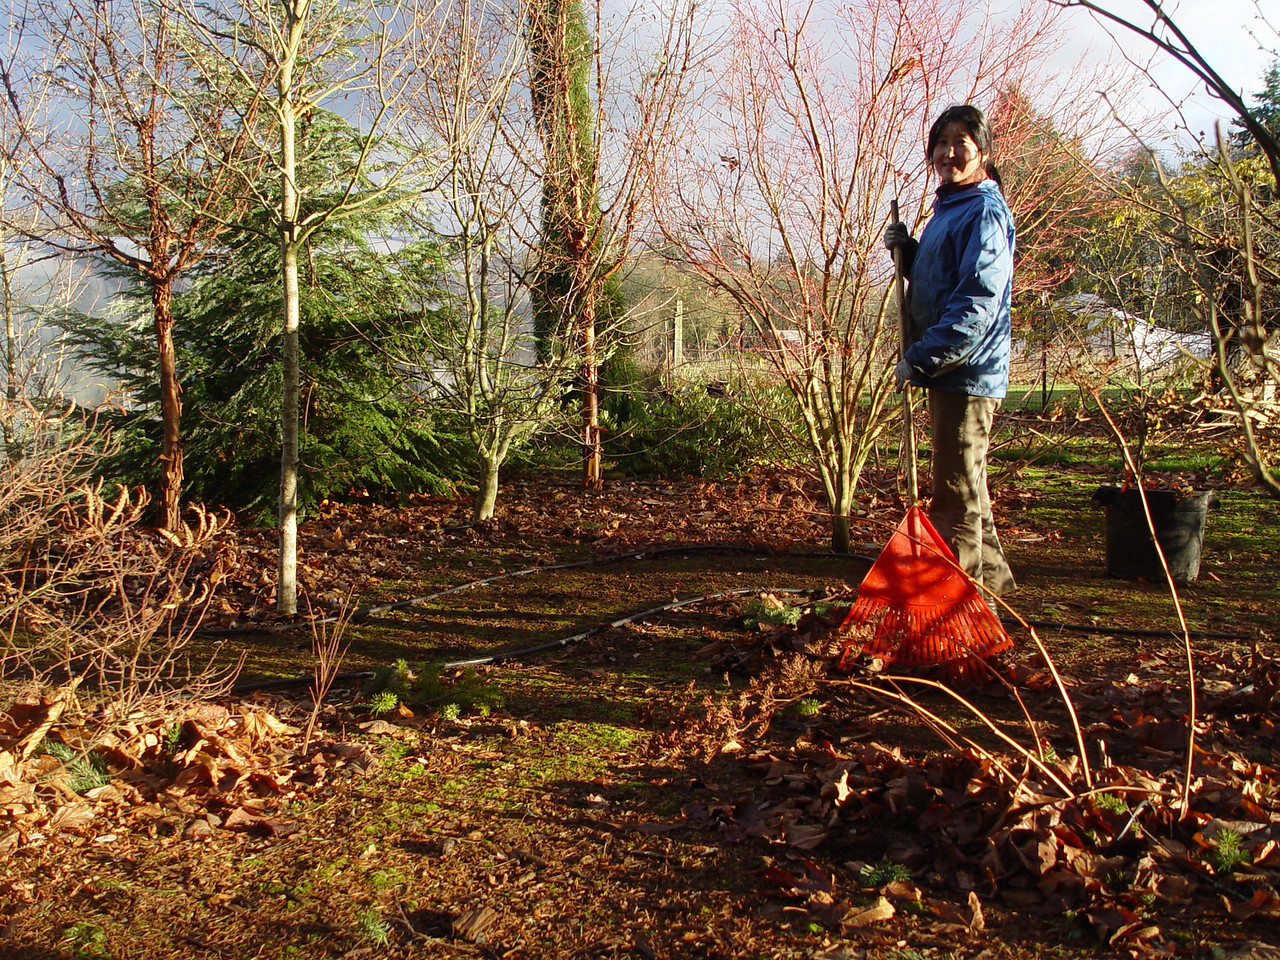 A necessary Autumn evil, Raking leaves!